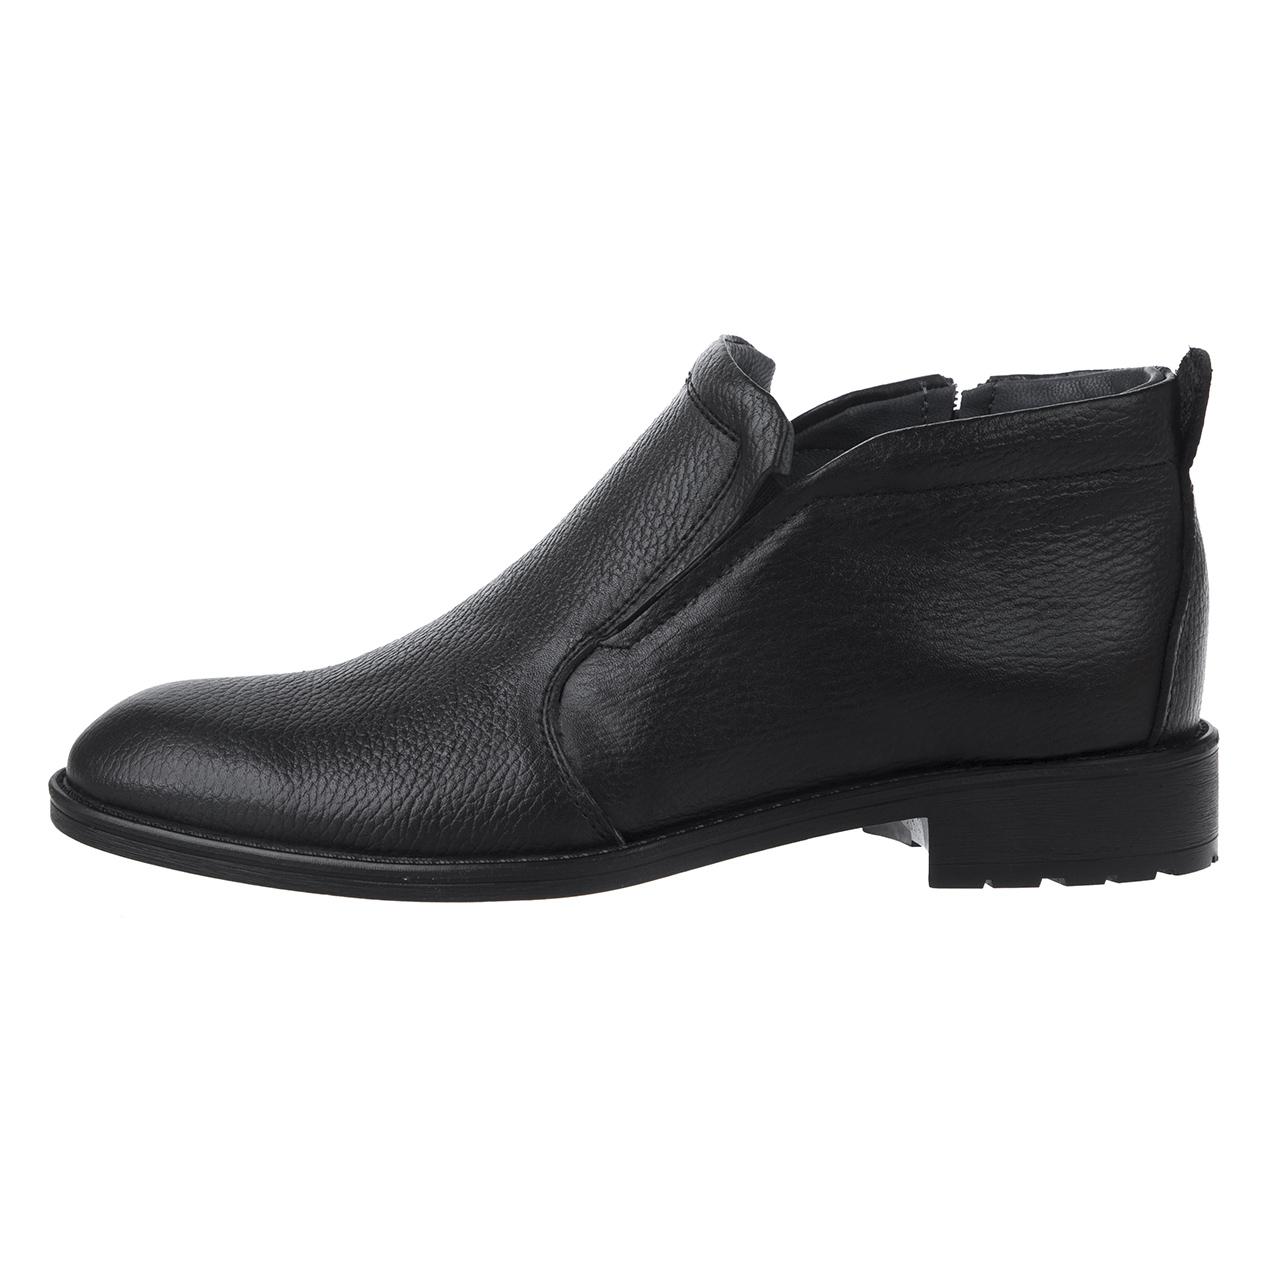 کفش مردانه ساینا چرم مدل آیهان